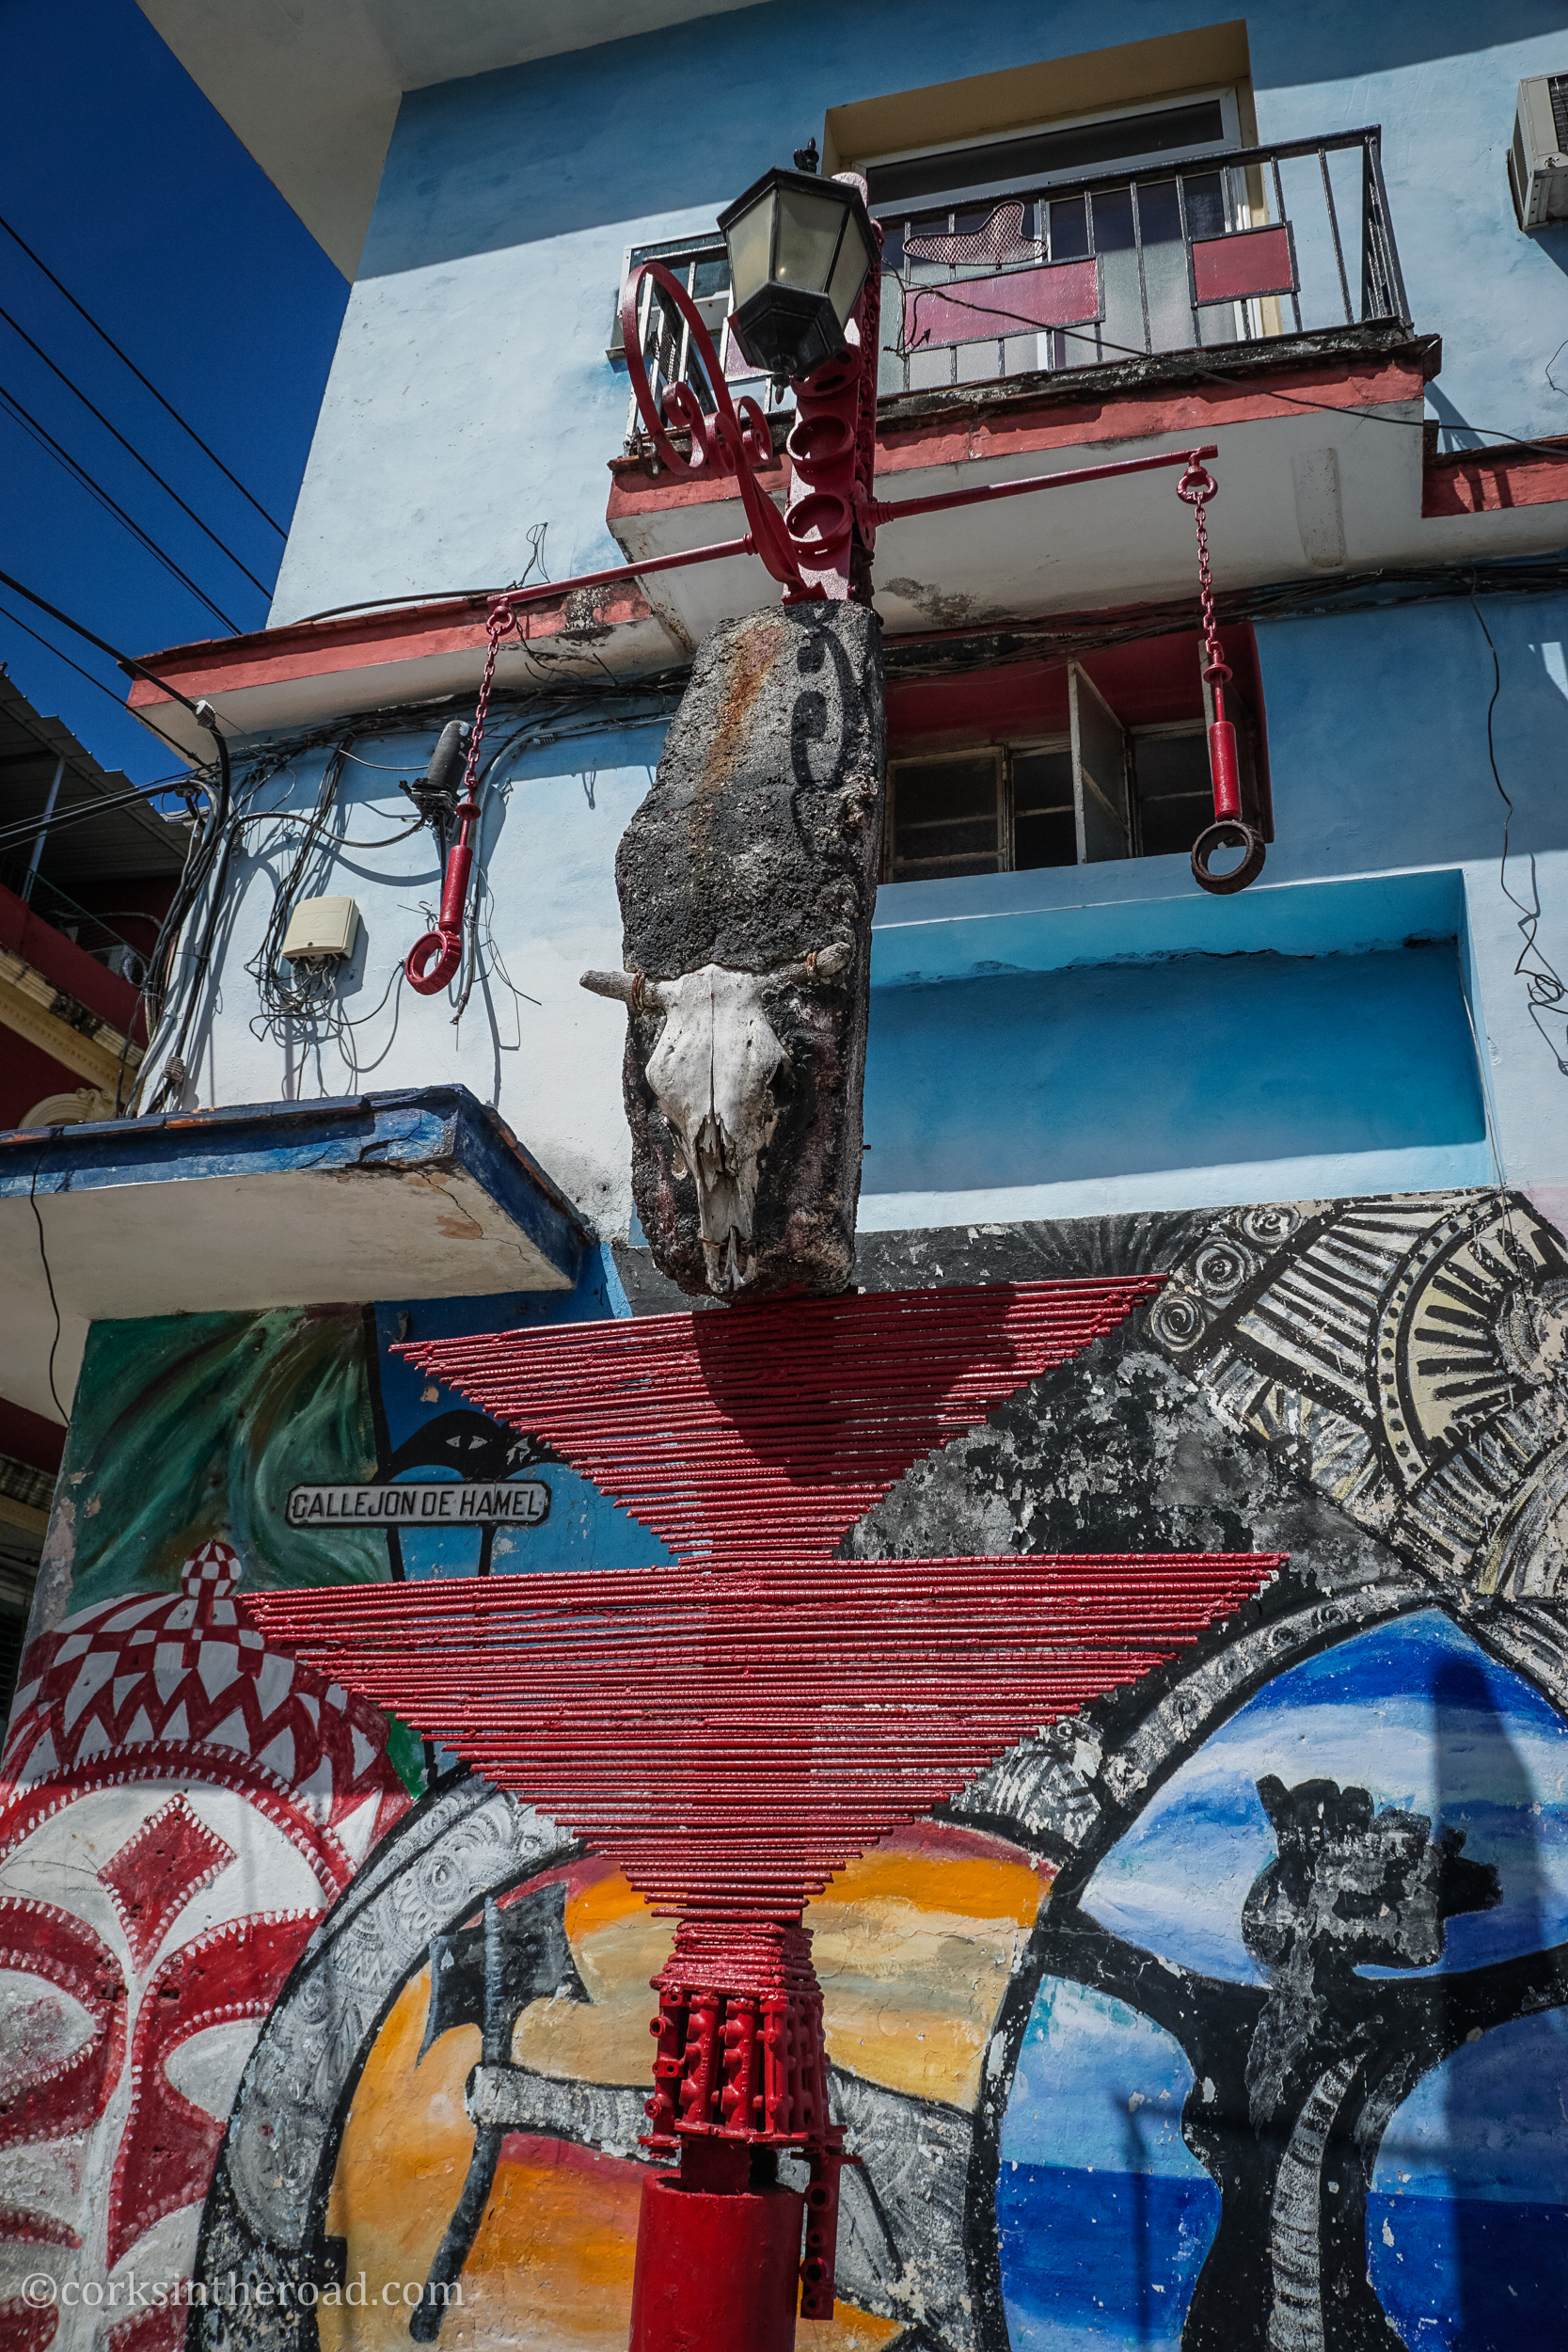 Corksintheroad, Cuba, Hamel.jpg